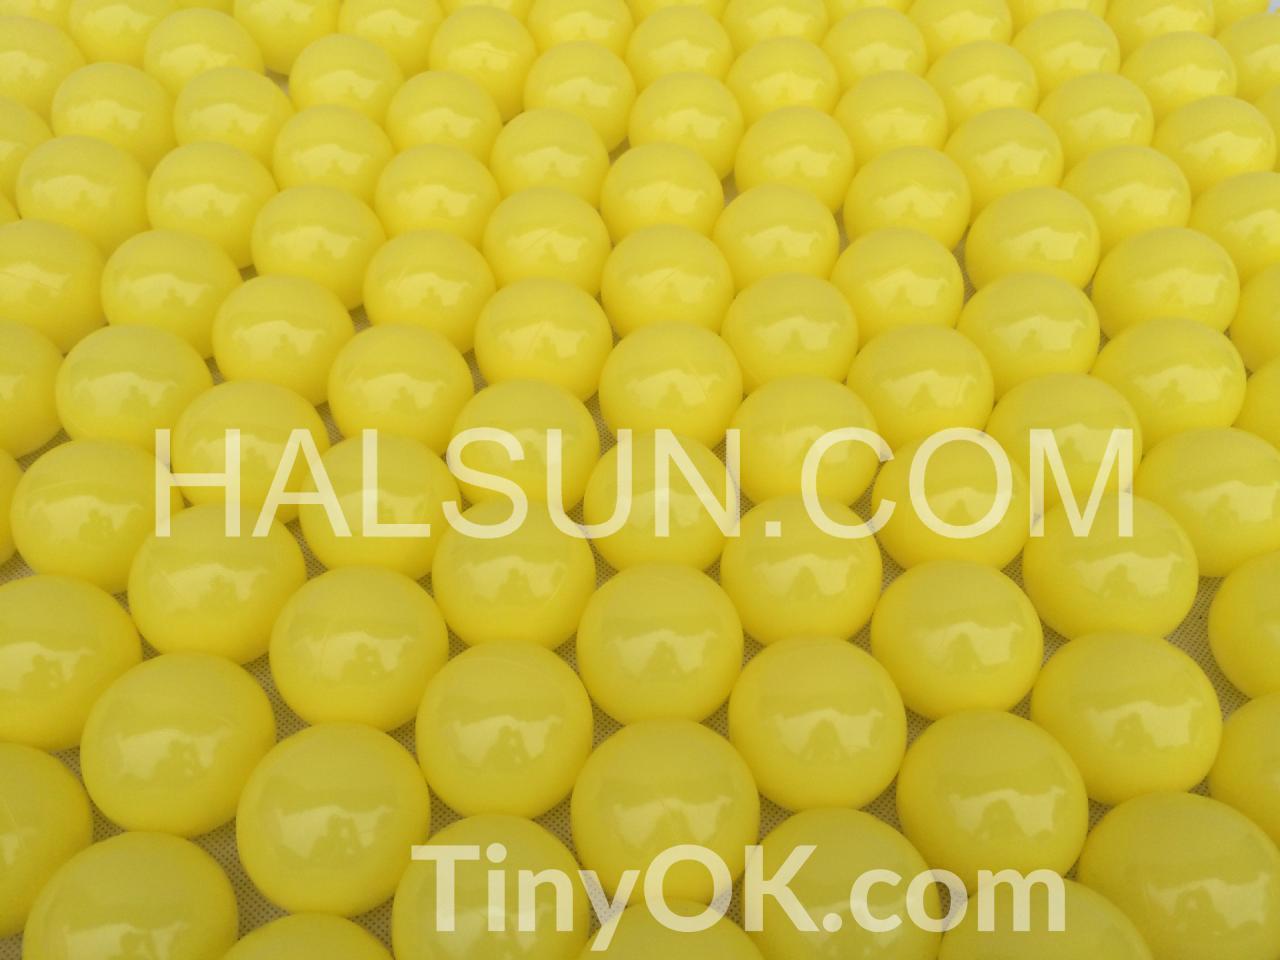 plastic-ocean-balls-16.jpg